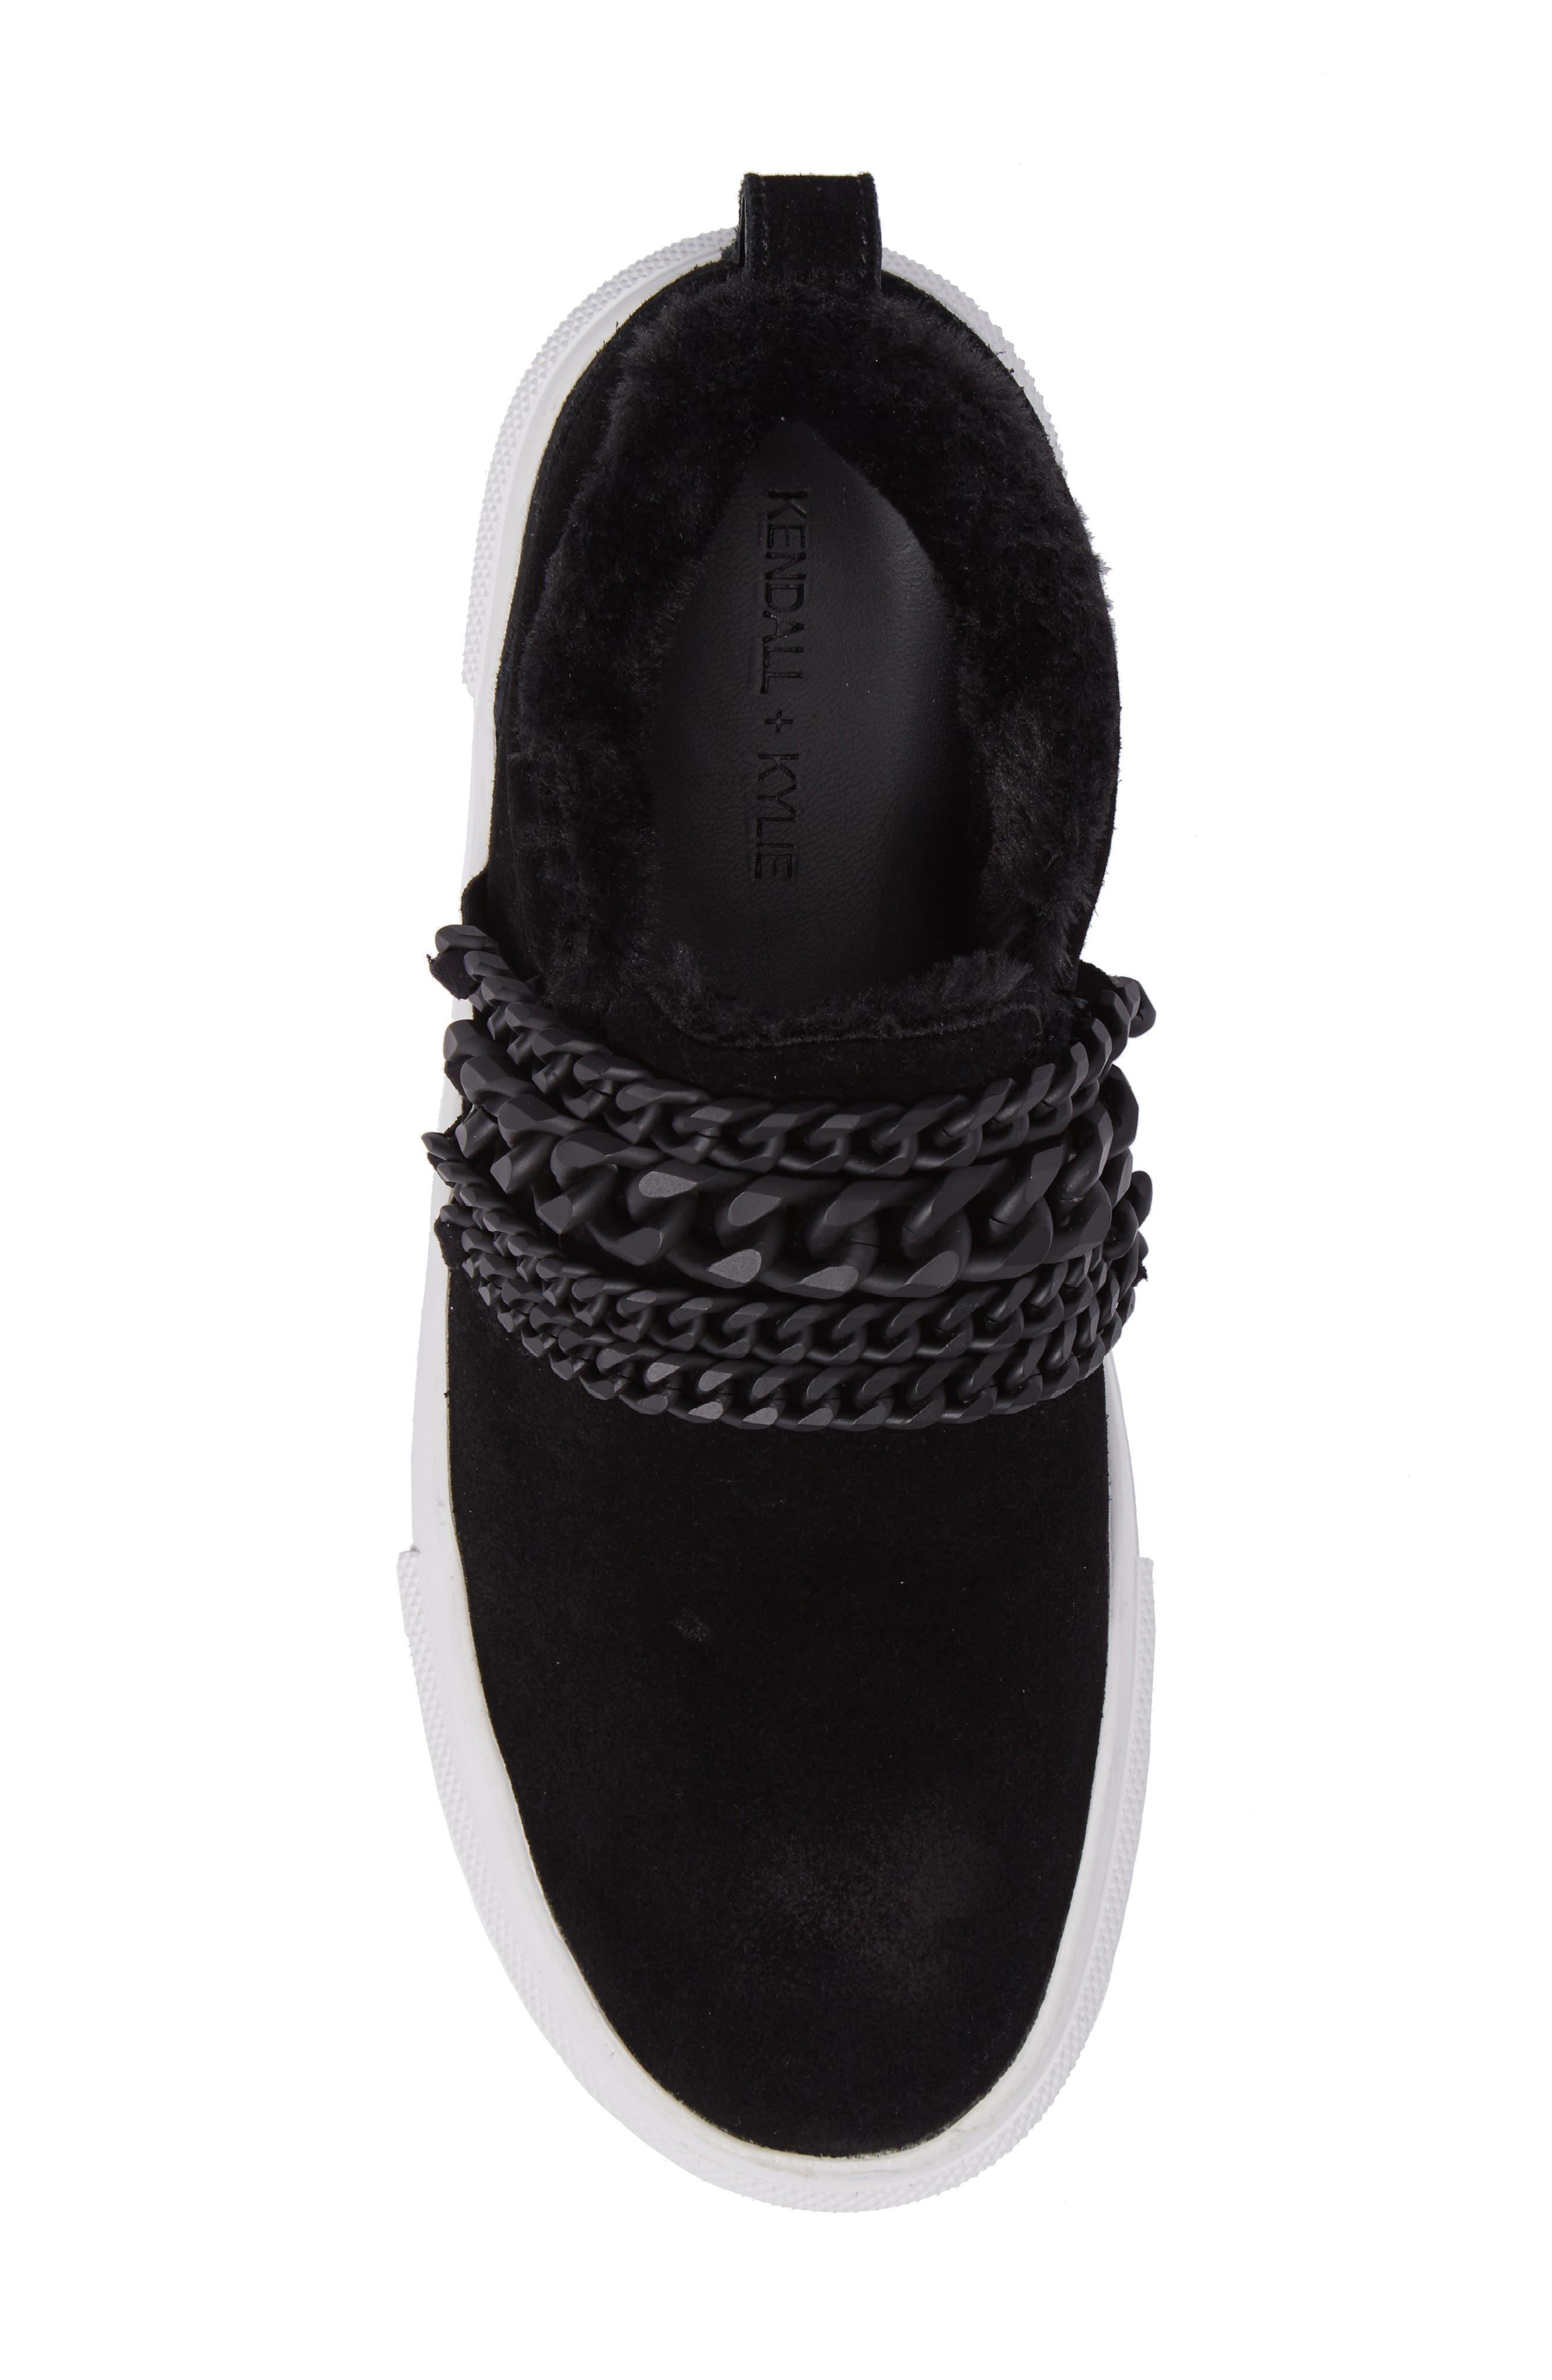 Tory Platform Sneaker,                             Alternate thumbnail 5, color,                             Black